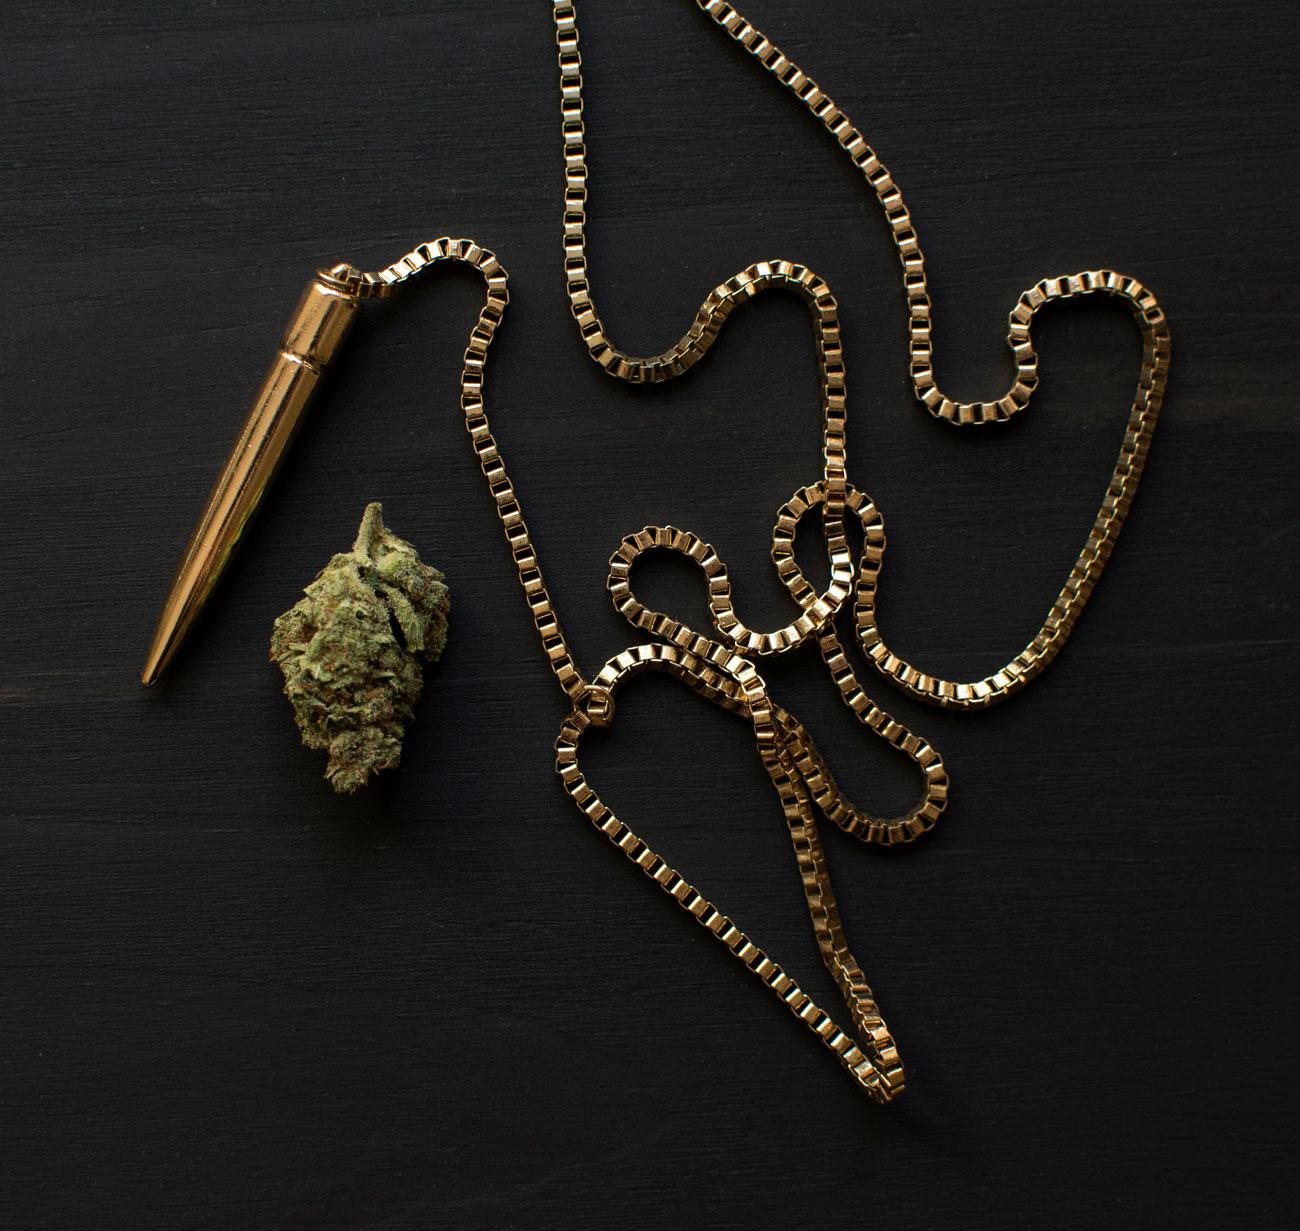 necklace-nug-greenandgold.jpg